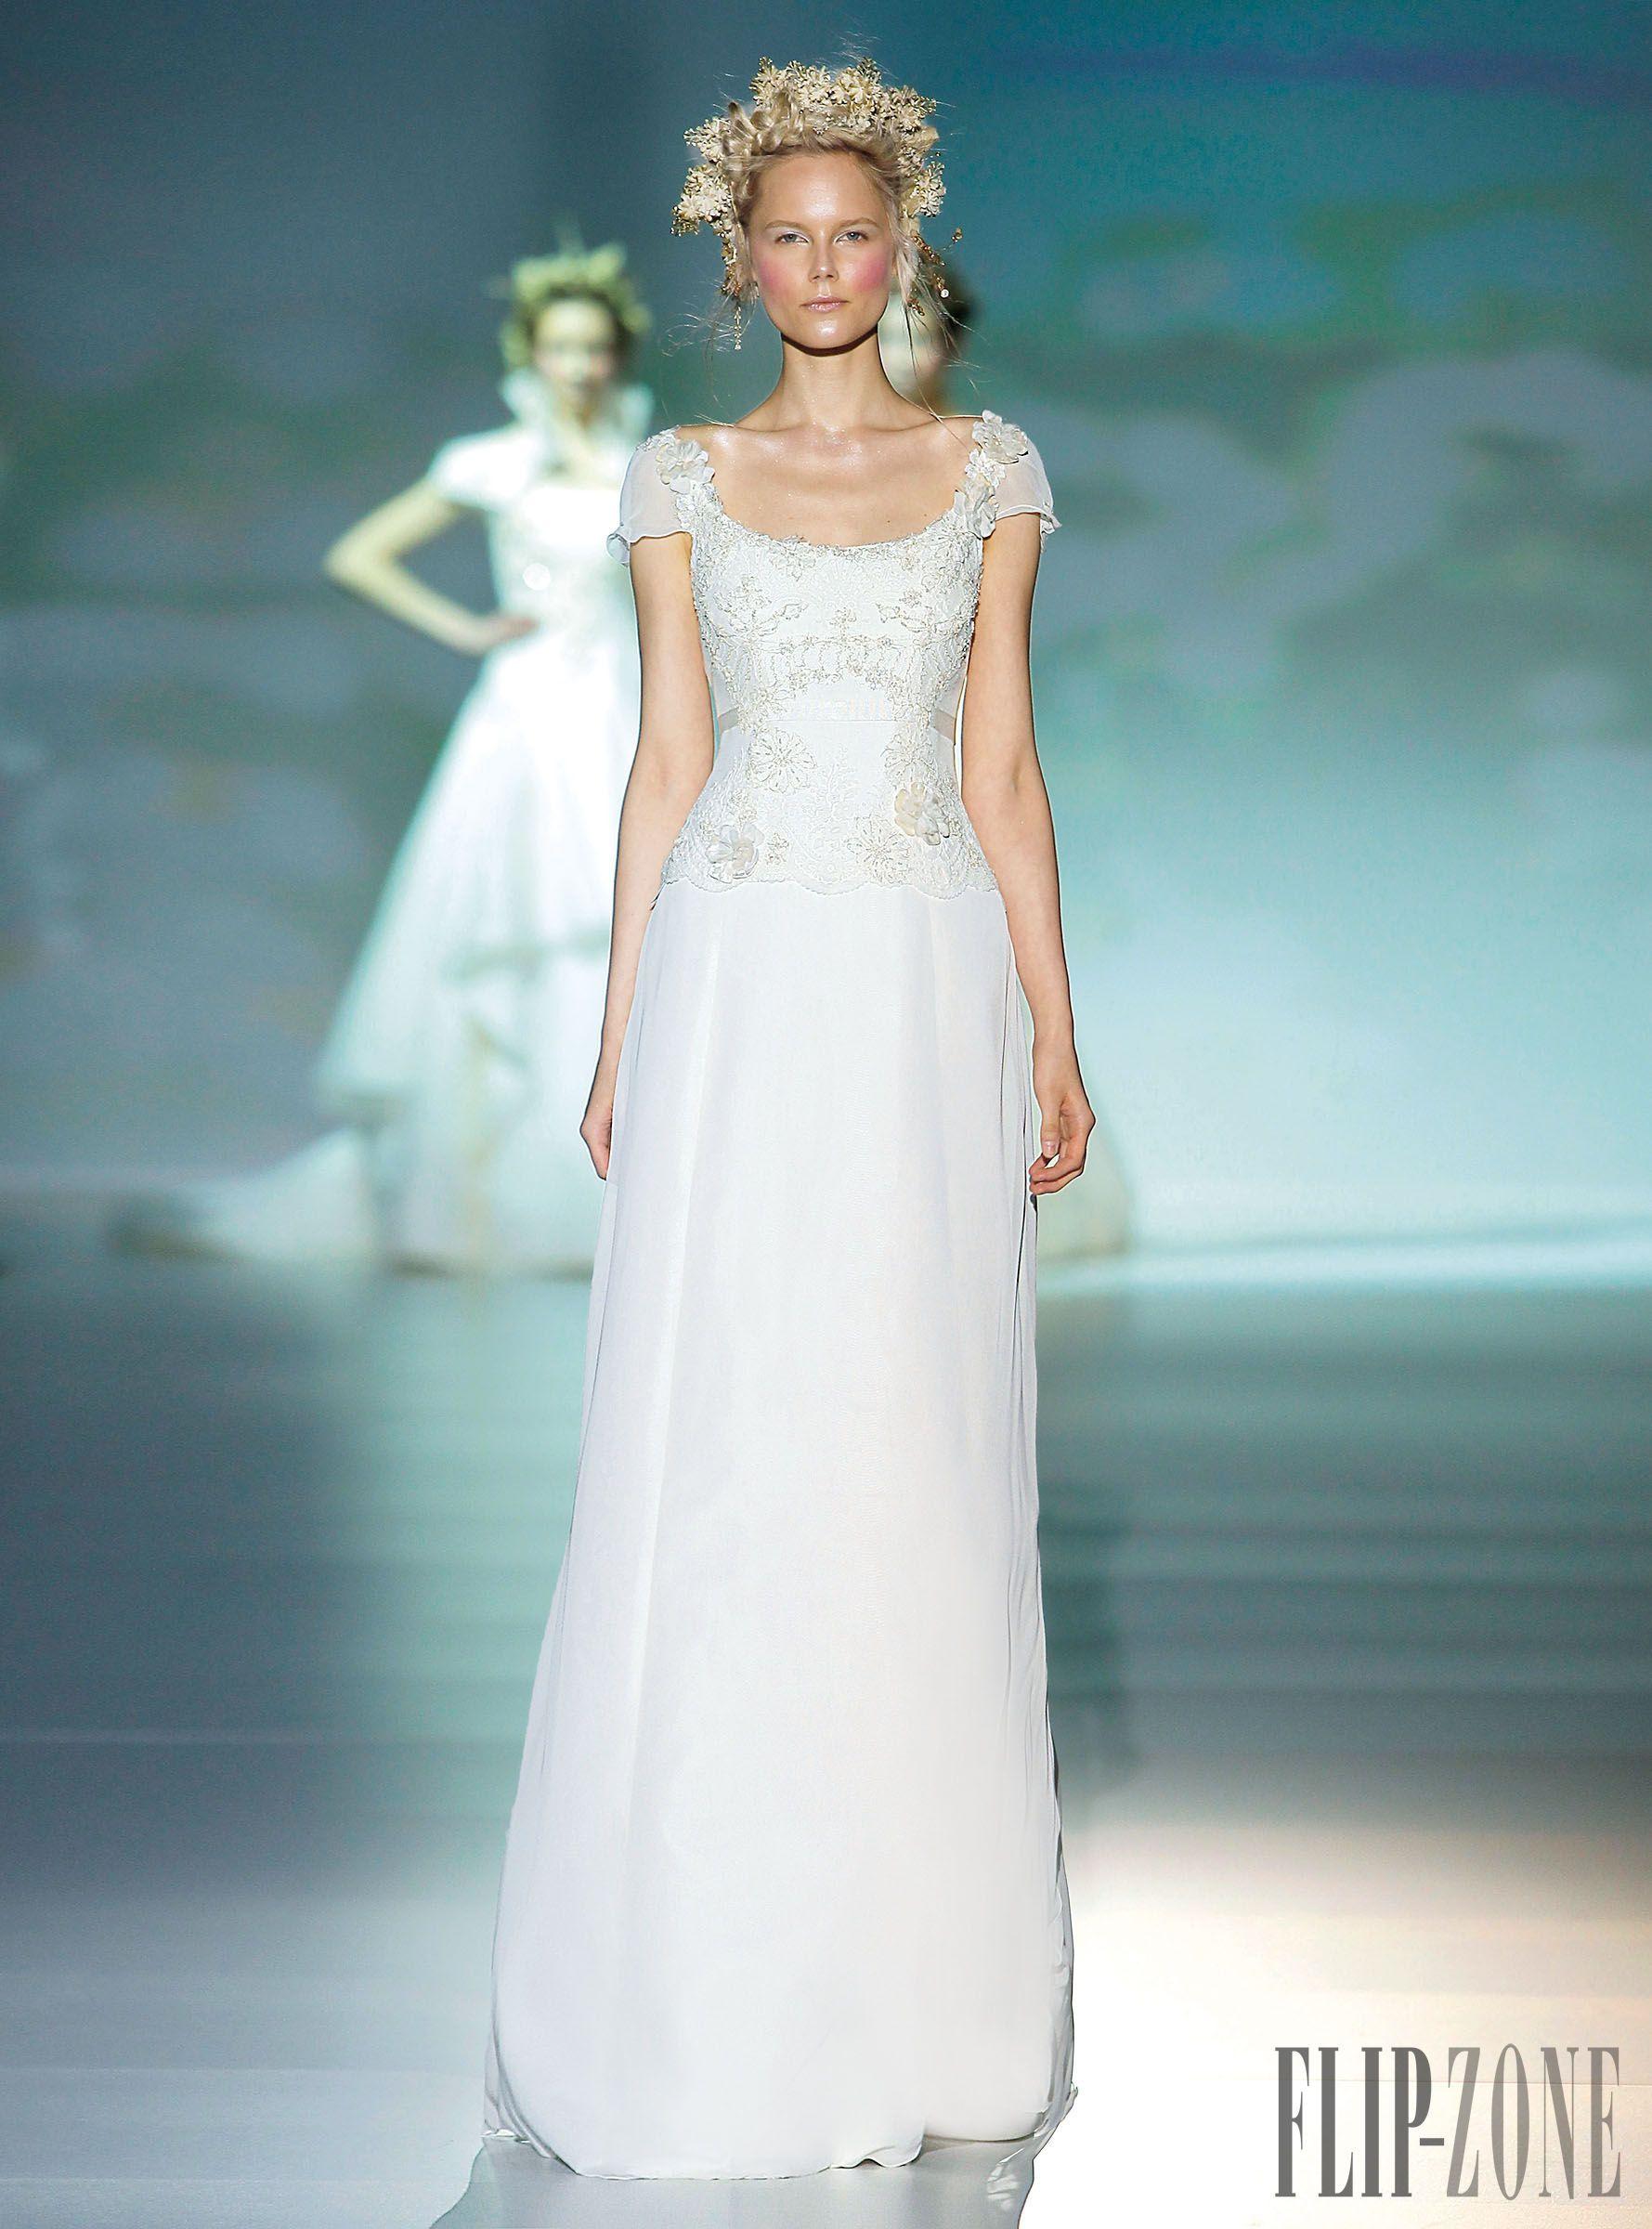 Victorio & Lucchino 2014 collection - Bridal | Boda